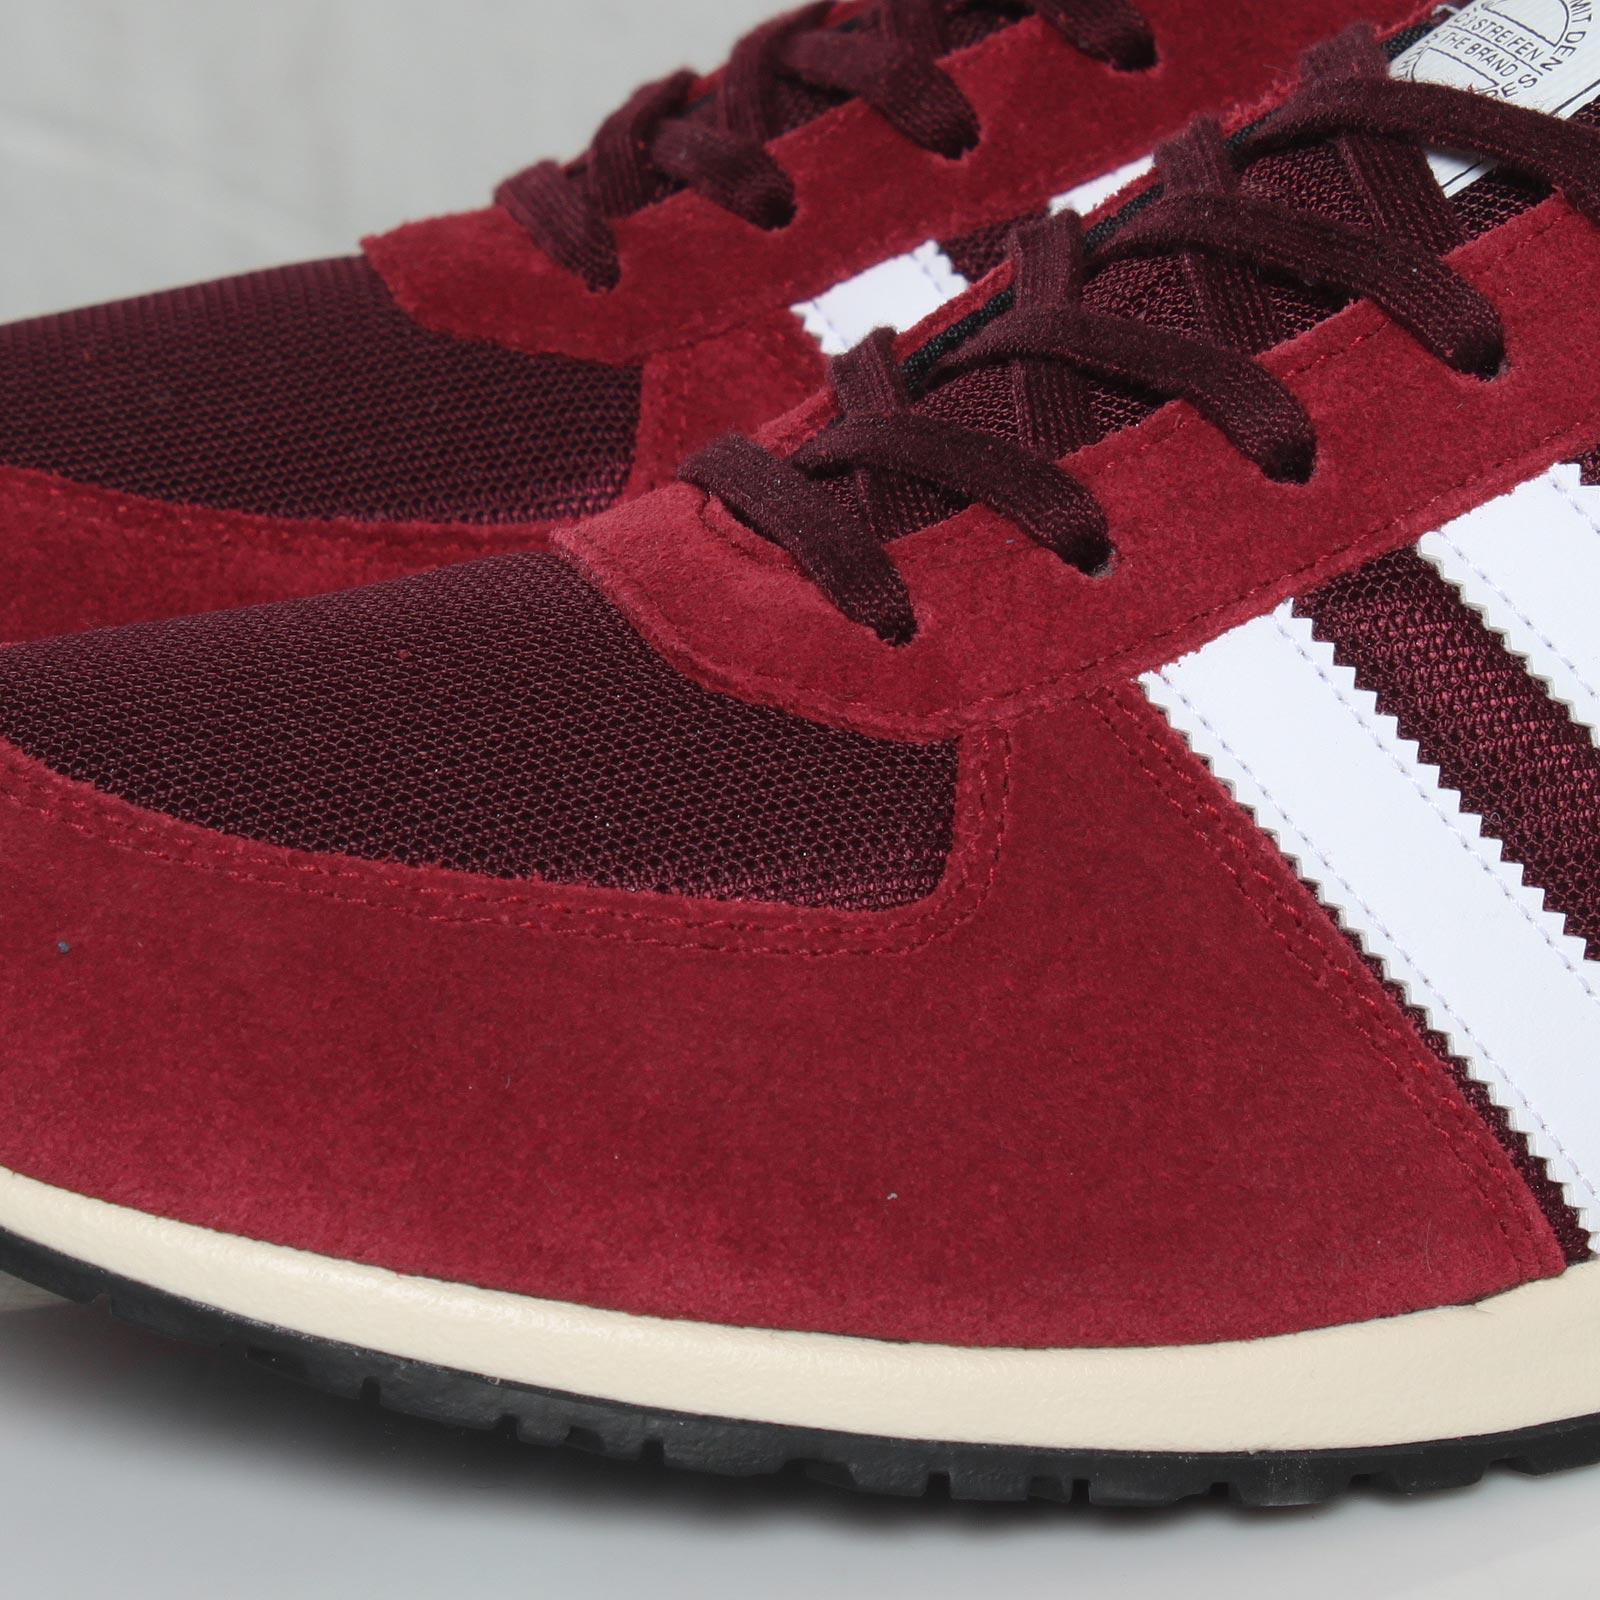 1409e983caecd0 adidas Adistar Racer - 109074 - Sneakersnstuff